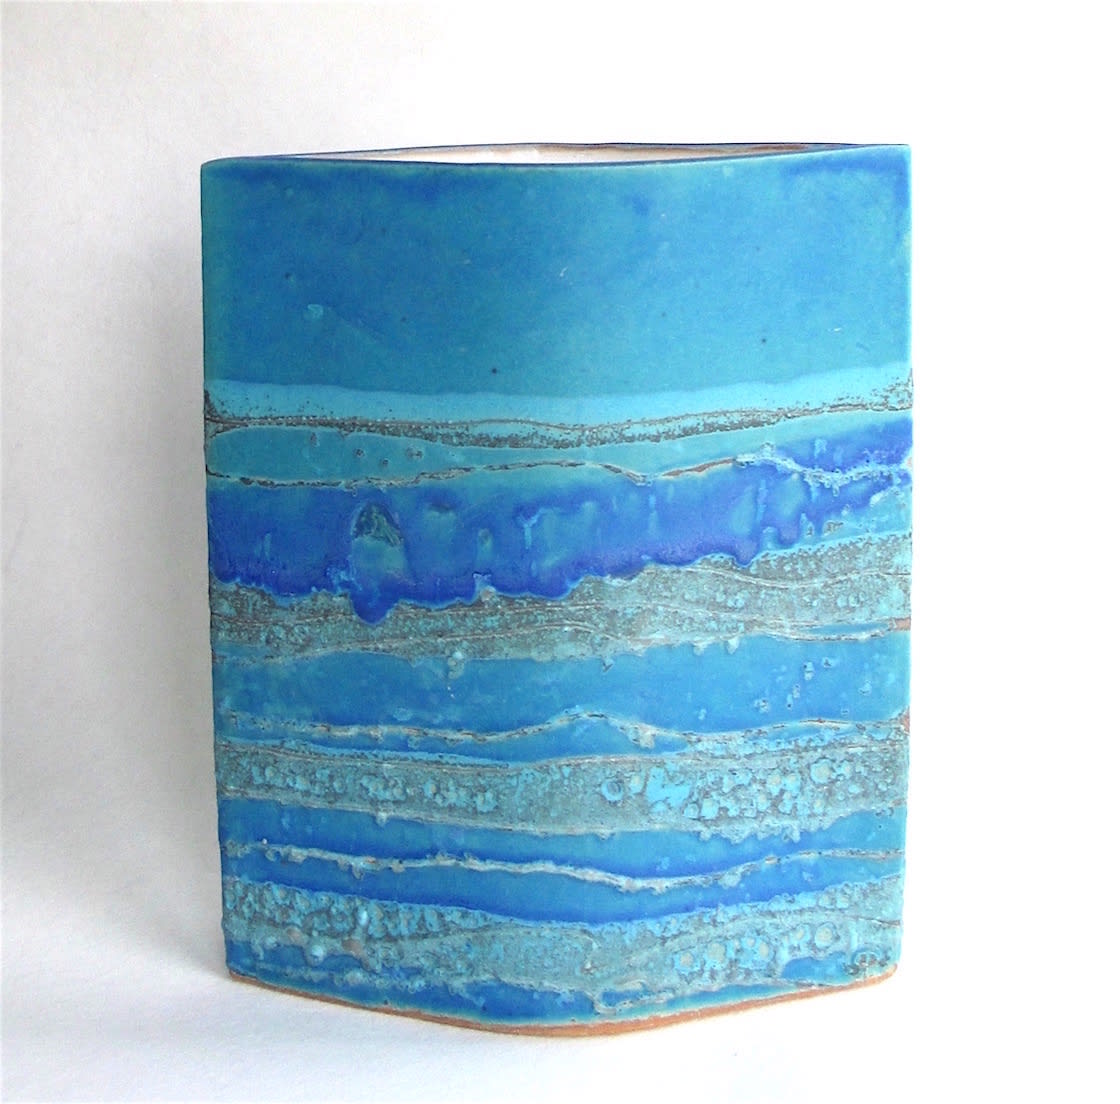 "<span class=""link fancybox-details-link""><a href=""/artists/44-sarah-perry/works/7442-sarah-perry-blue-water-ellipse-2020/"">View Detail Page</a></span><div class=""artist""><strong>Sarah Perry</strong></div> <div class=""title""><em>Blue Water Ellipse</em>, 2020</div> <div class=""medium"">Stoneware<br /> Impressed with the artist's seal 'SP'</div> <div class=""dimensions"">h. 28 cm x w. 24 cm x d. 6.5 cm</div><div class=""copyright_line"">Own Art: £35.20 x 10 months, 0% APR</div>"